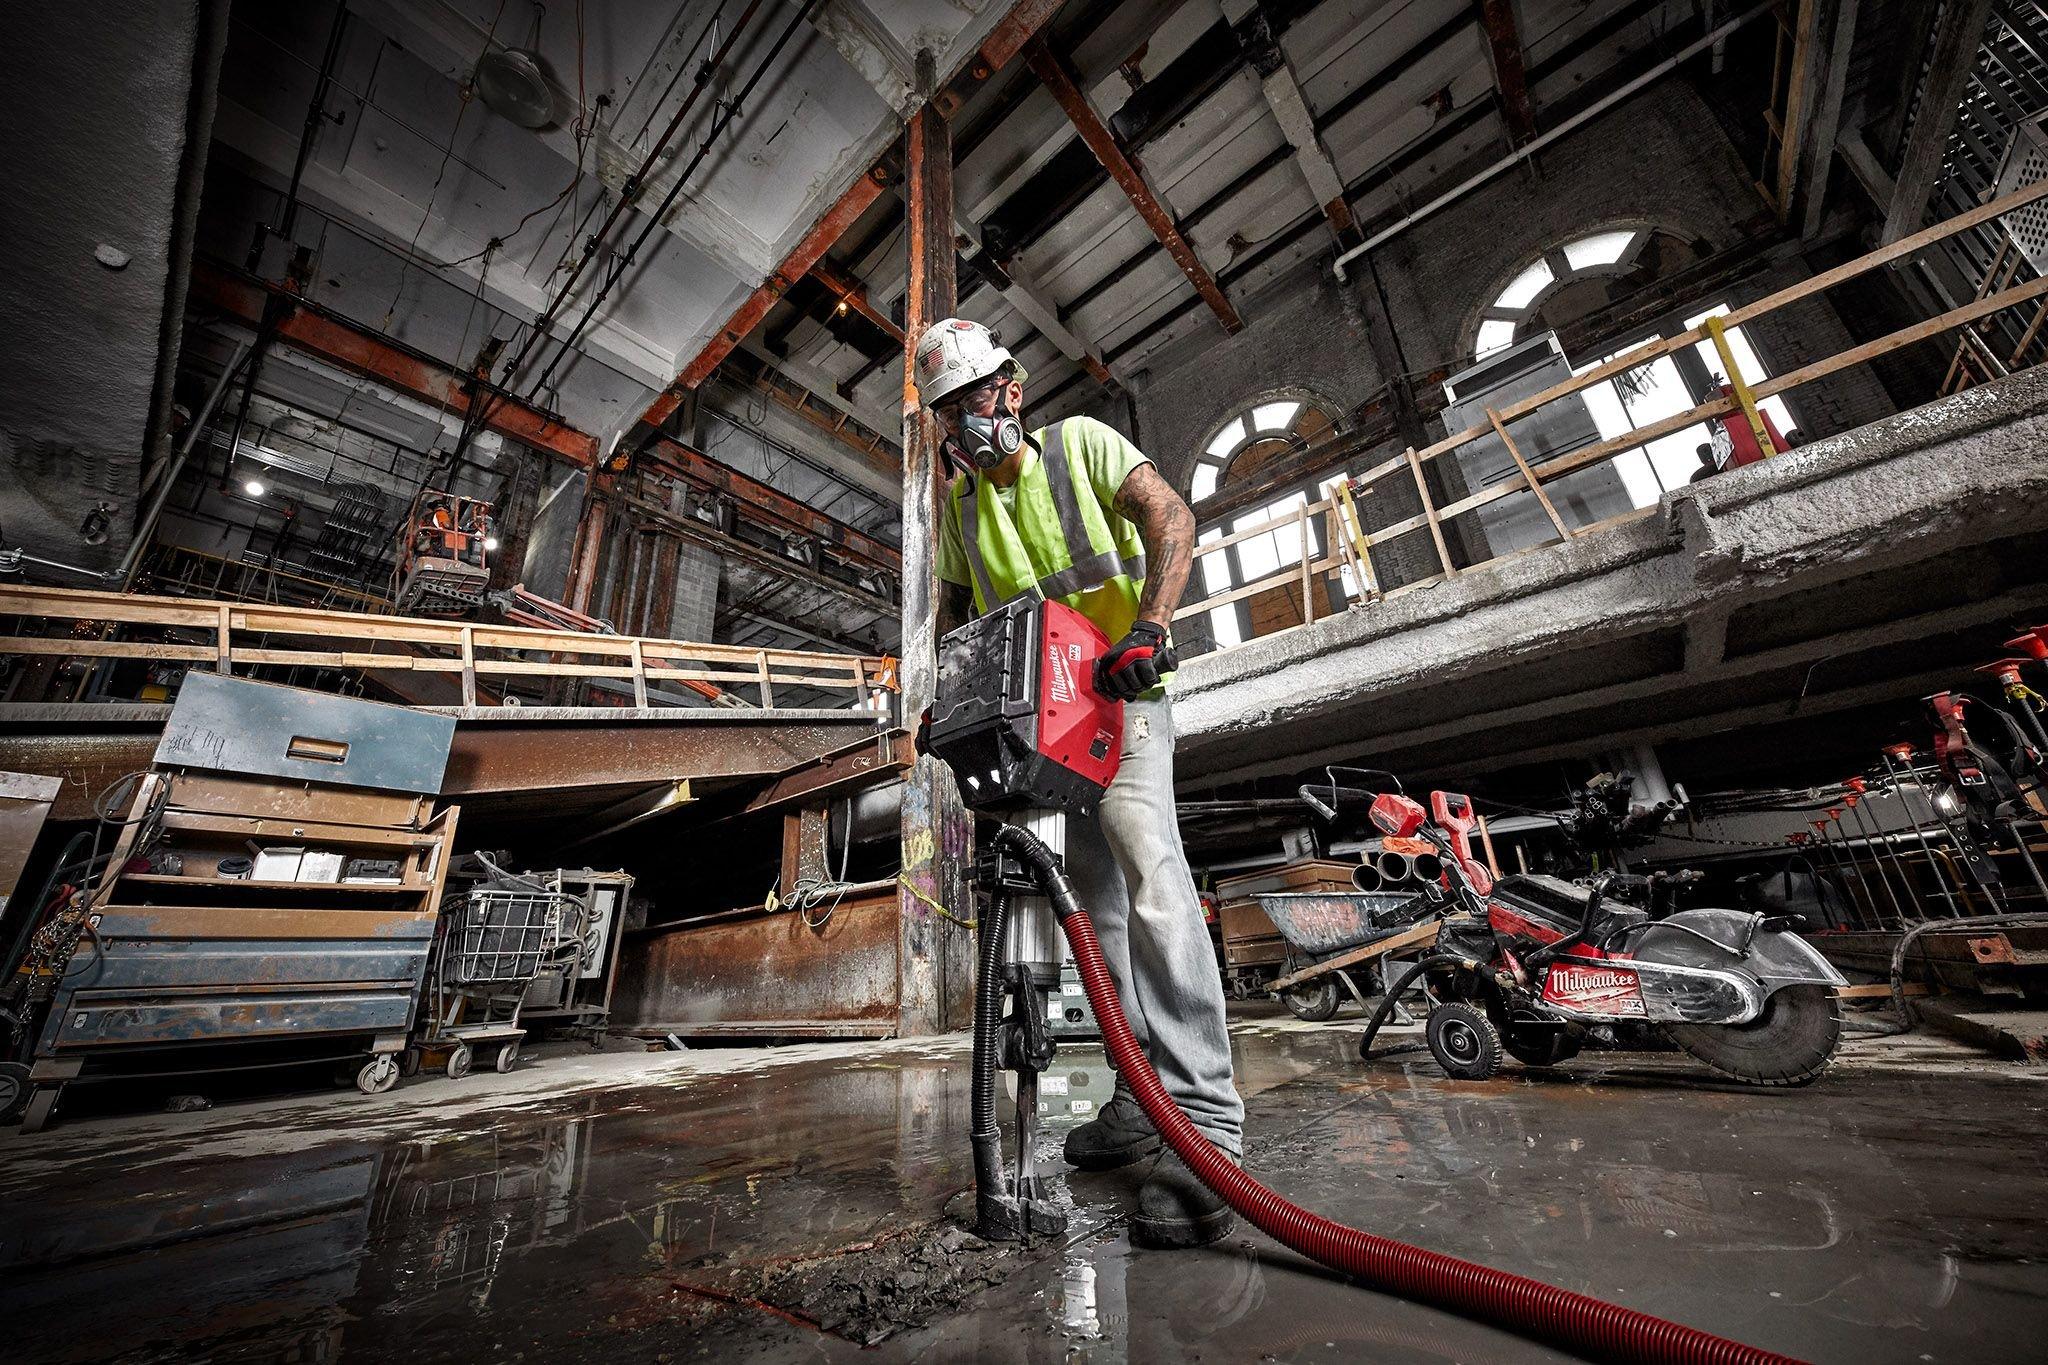 A cement mason uses a Milwaukee breaker to break up concrete floor